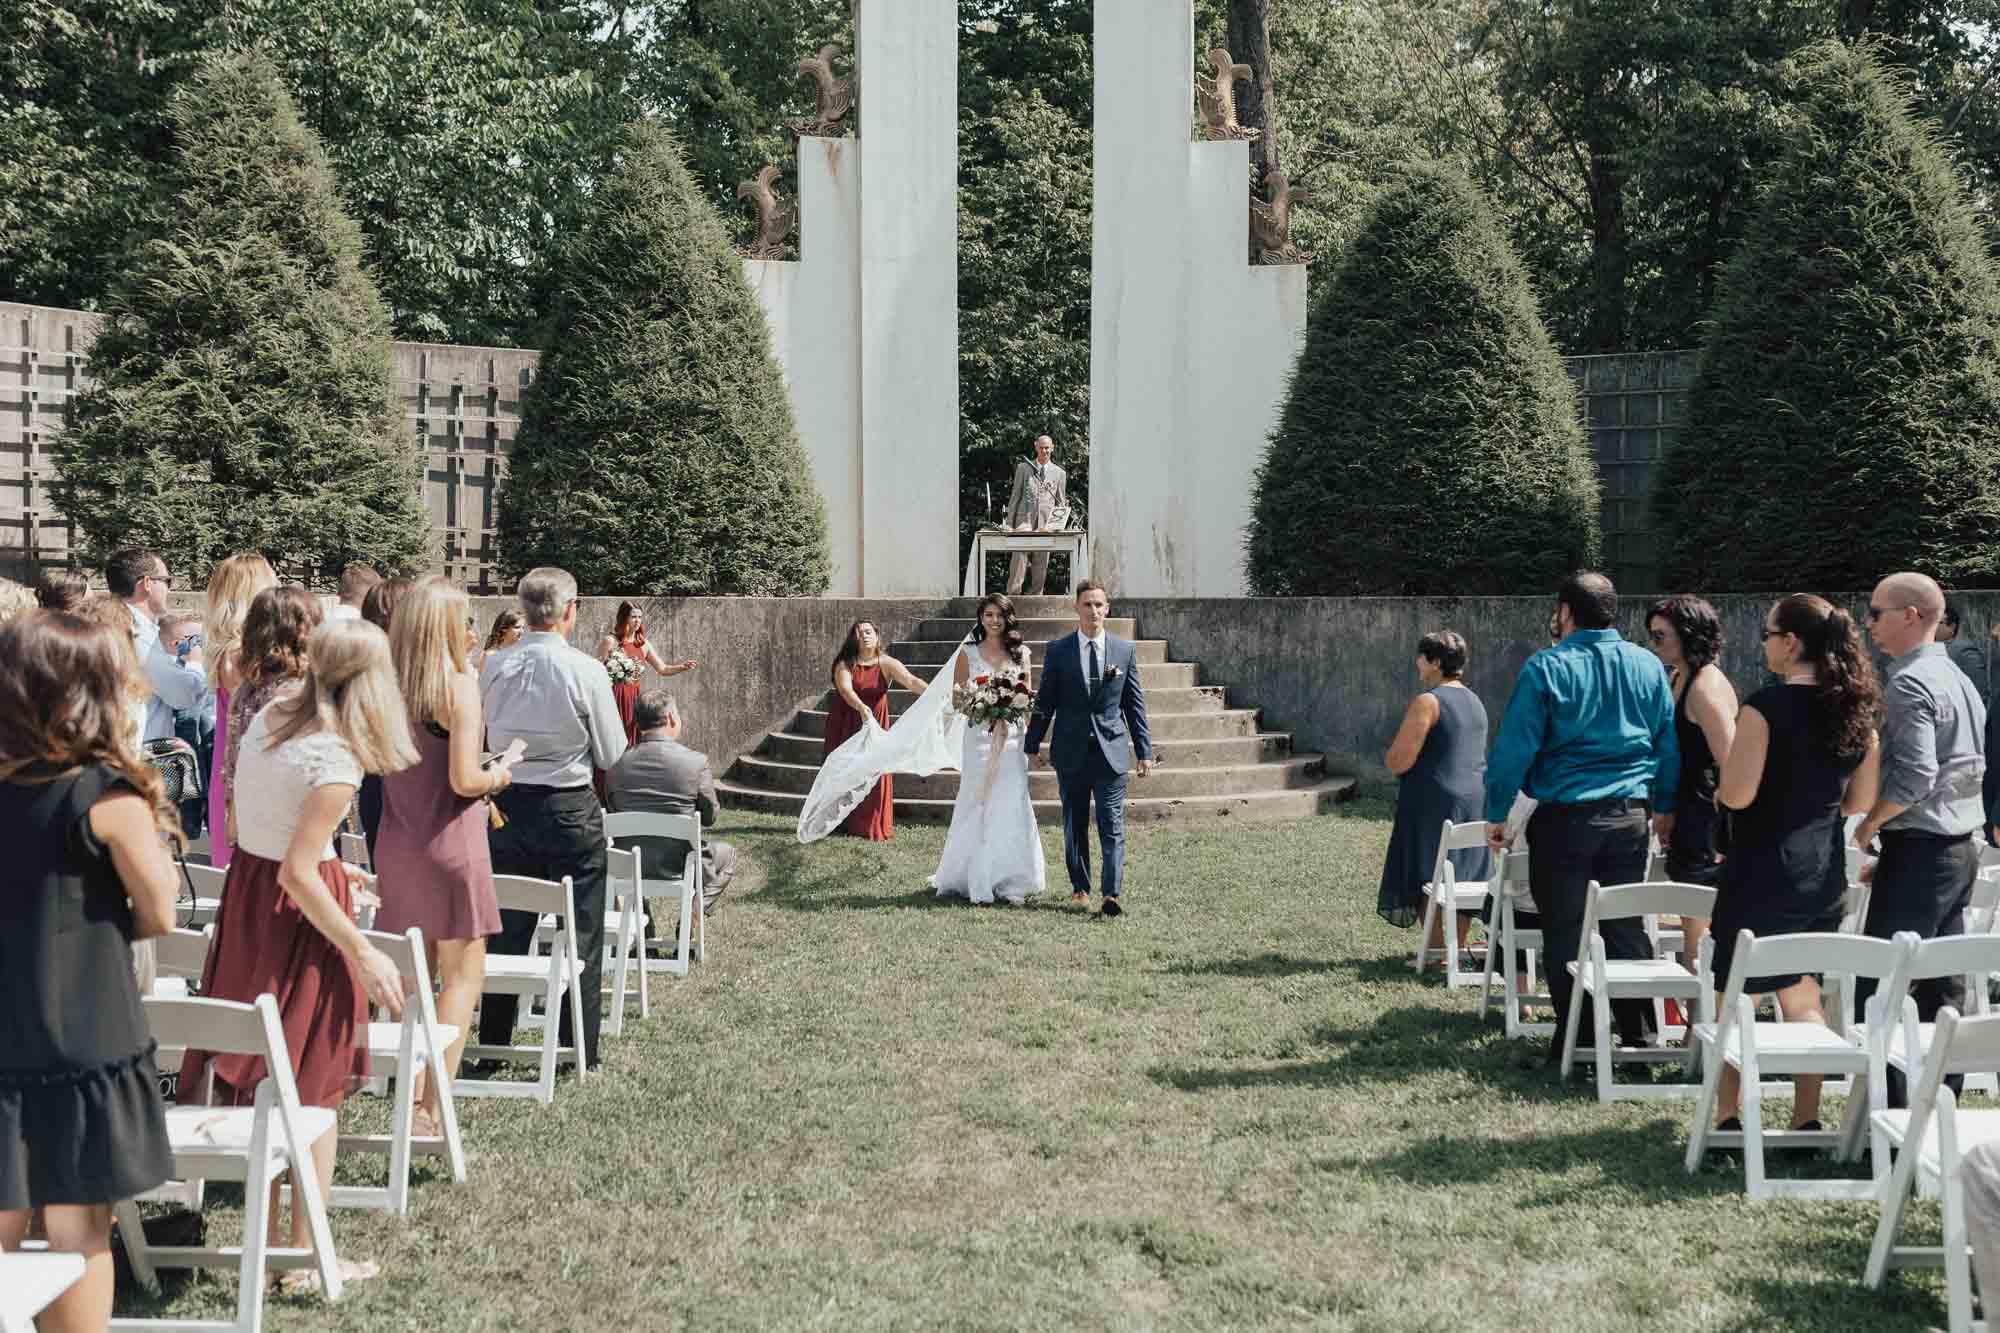 champaign_il_wedding_photography-0340.jpg